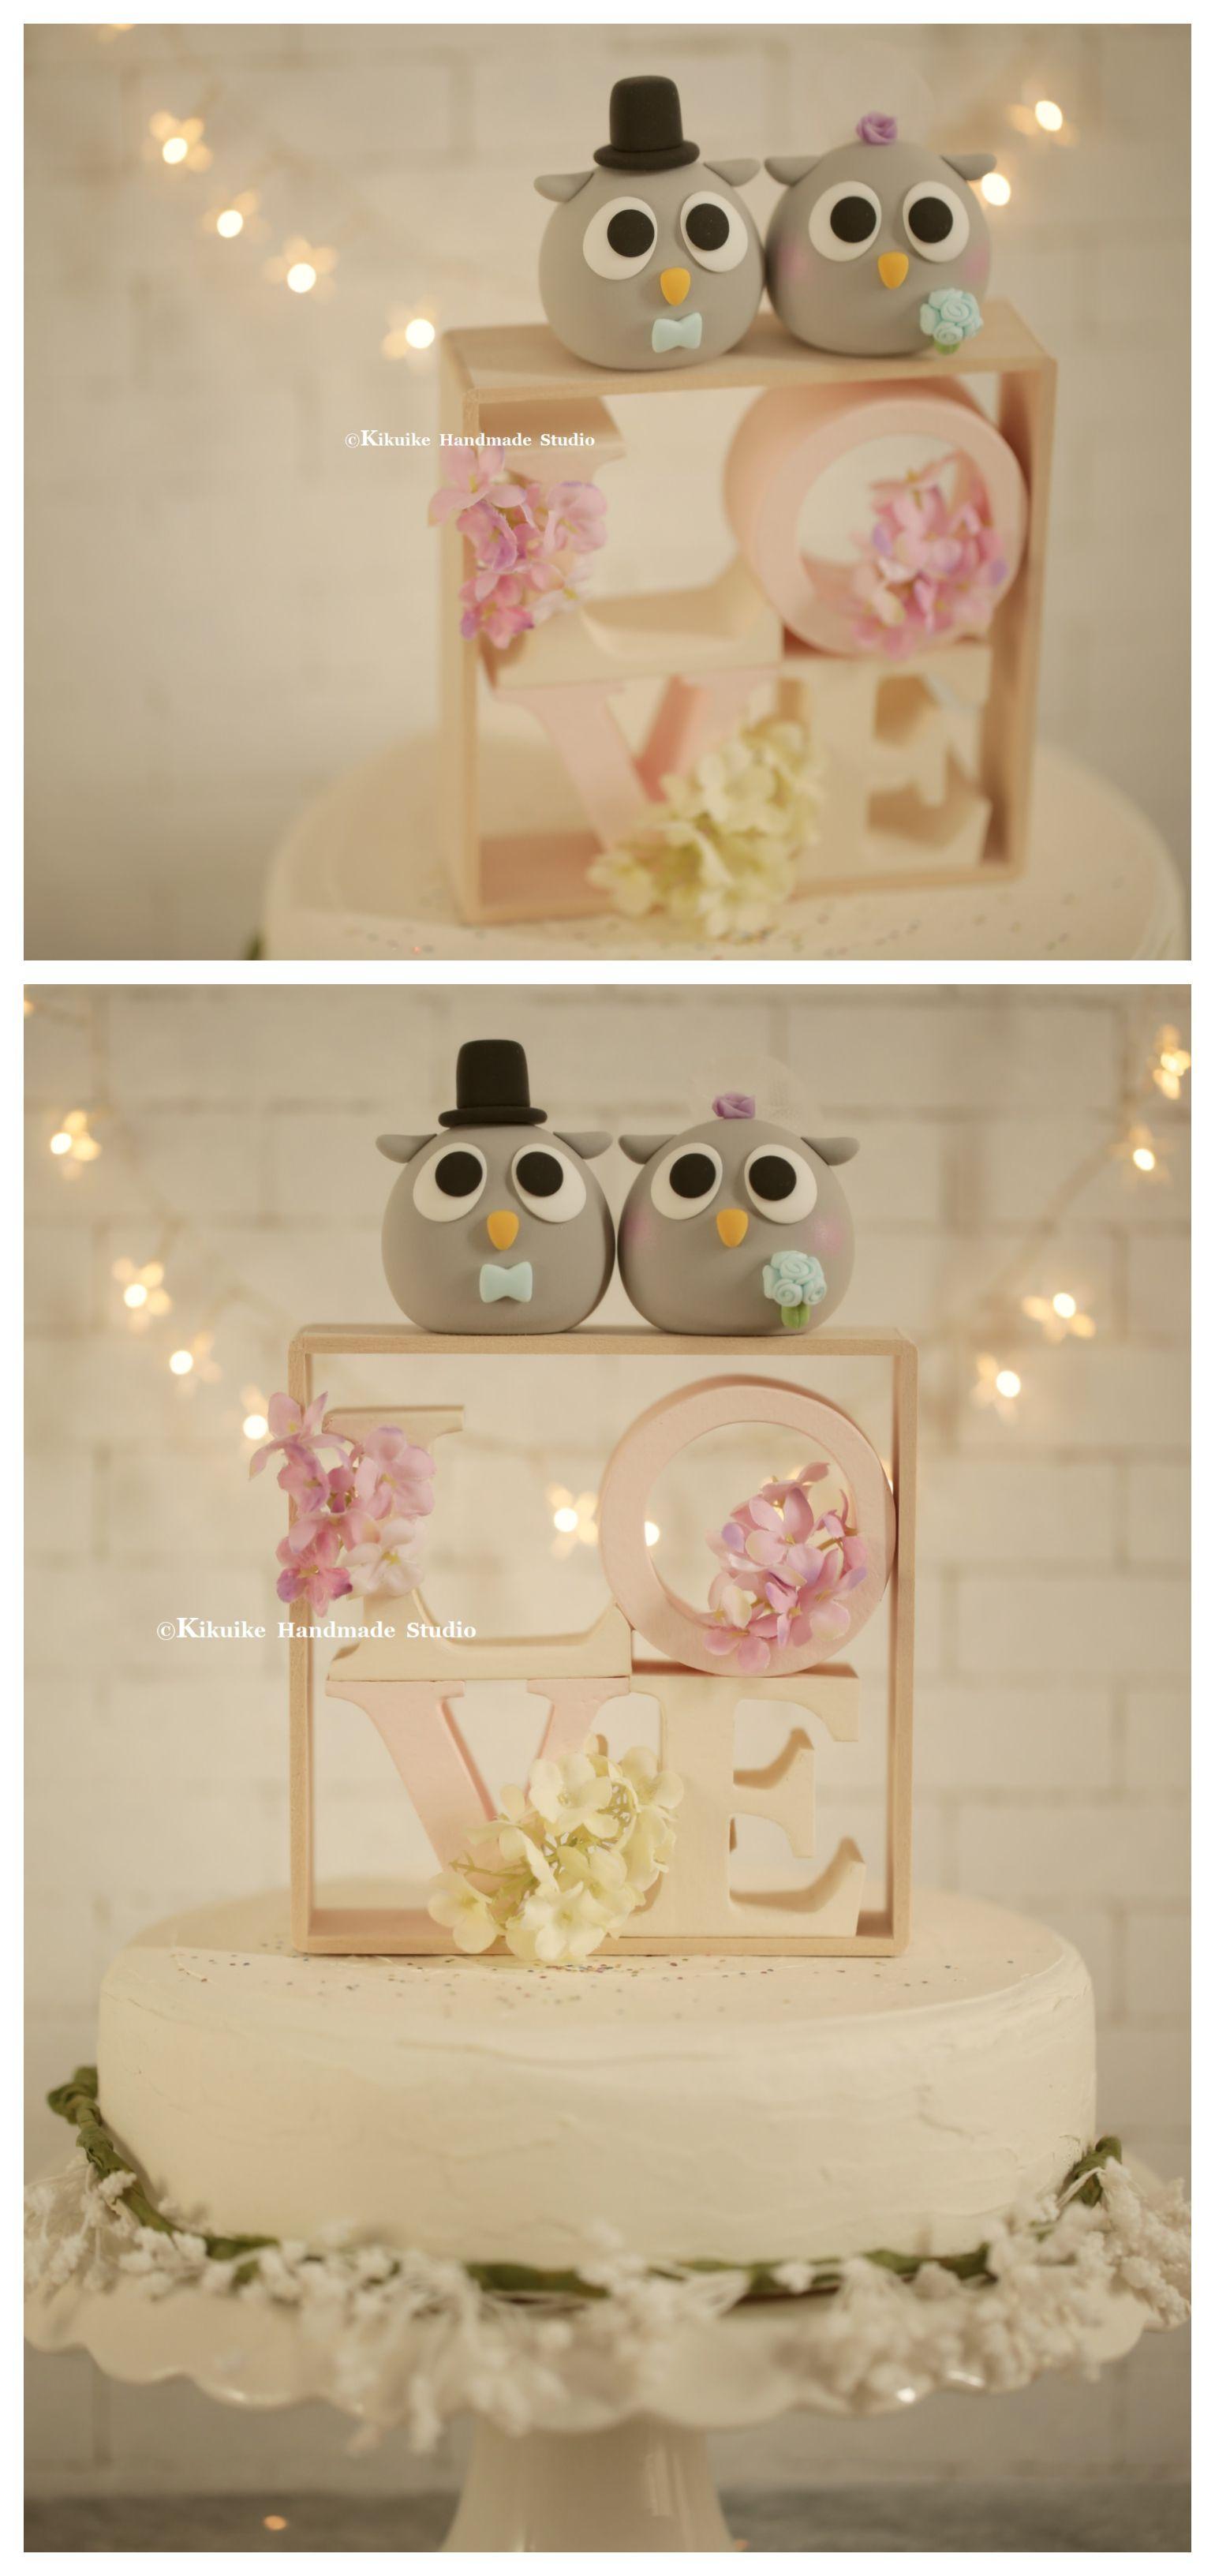 Owls wedding cake topper mochiegg cake topper pinterest